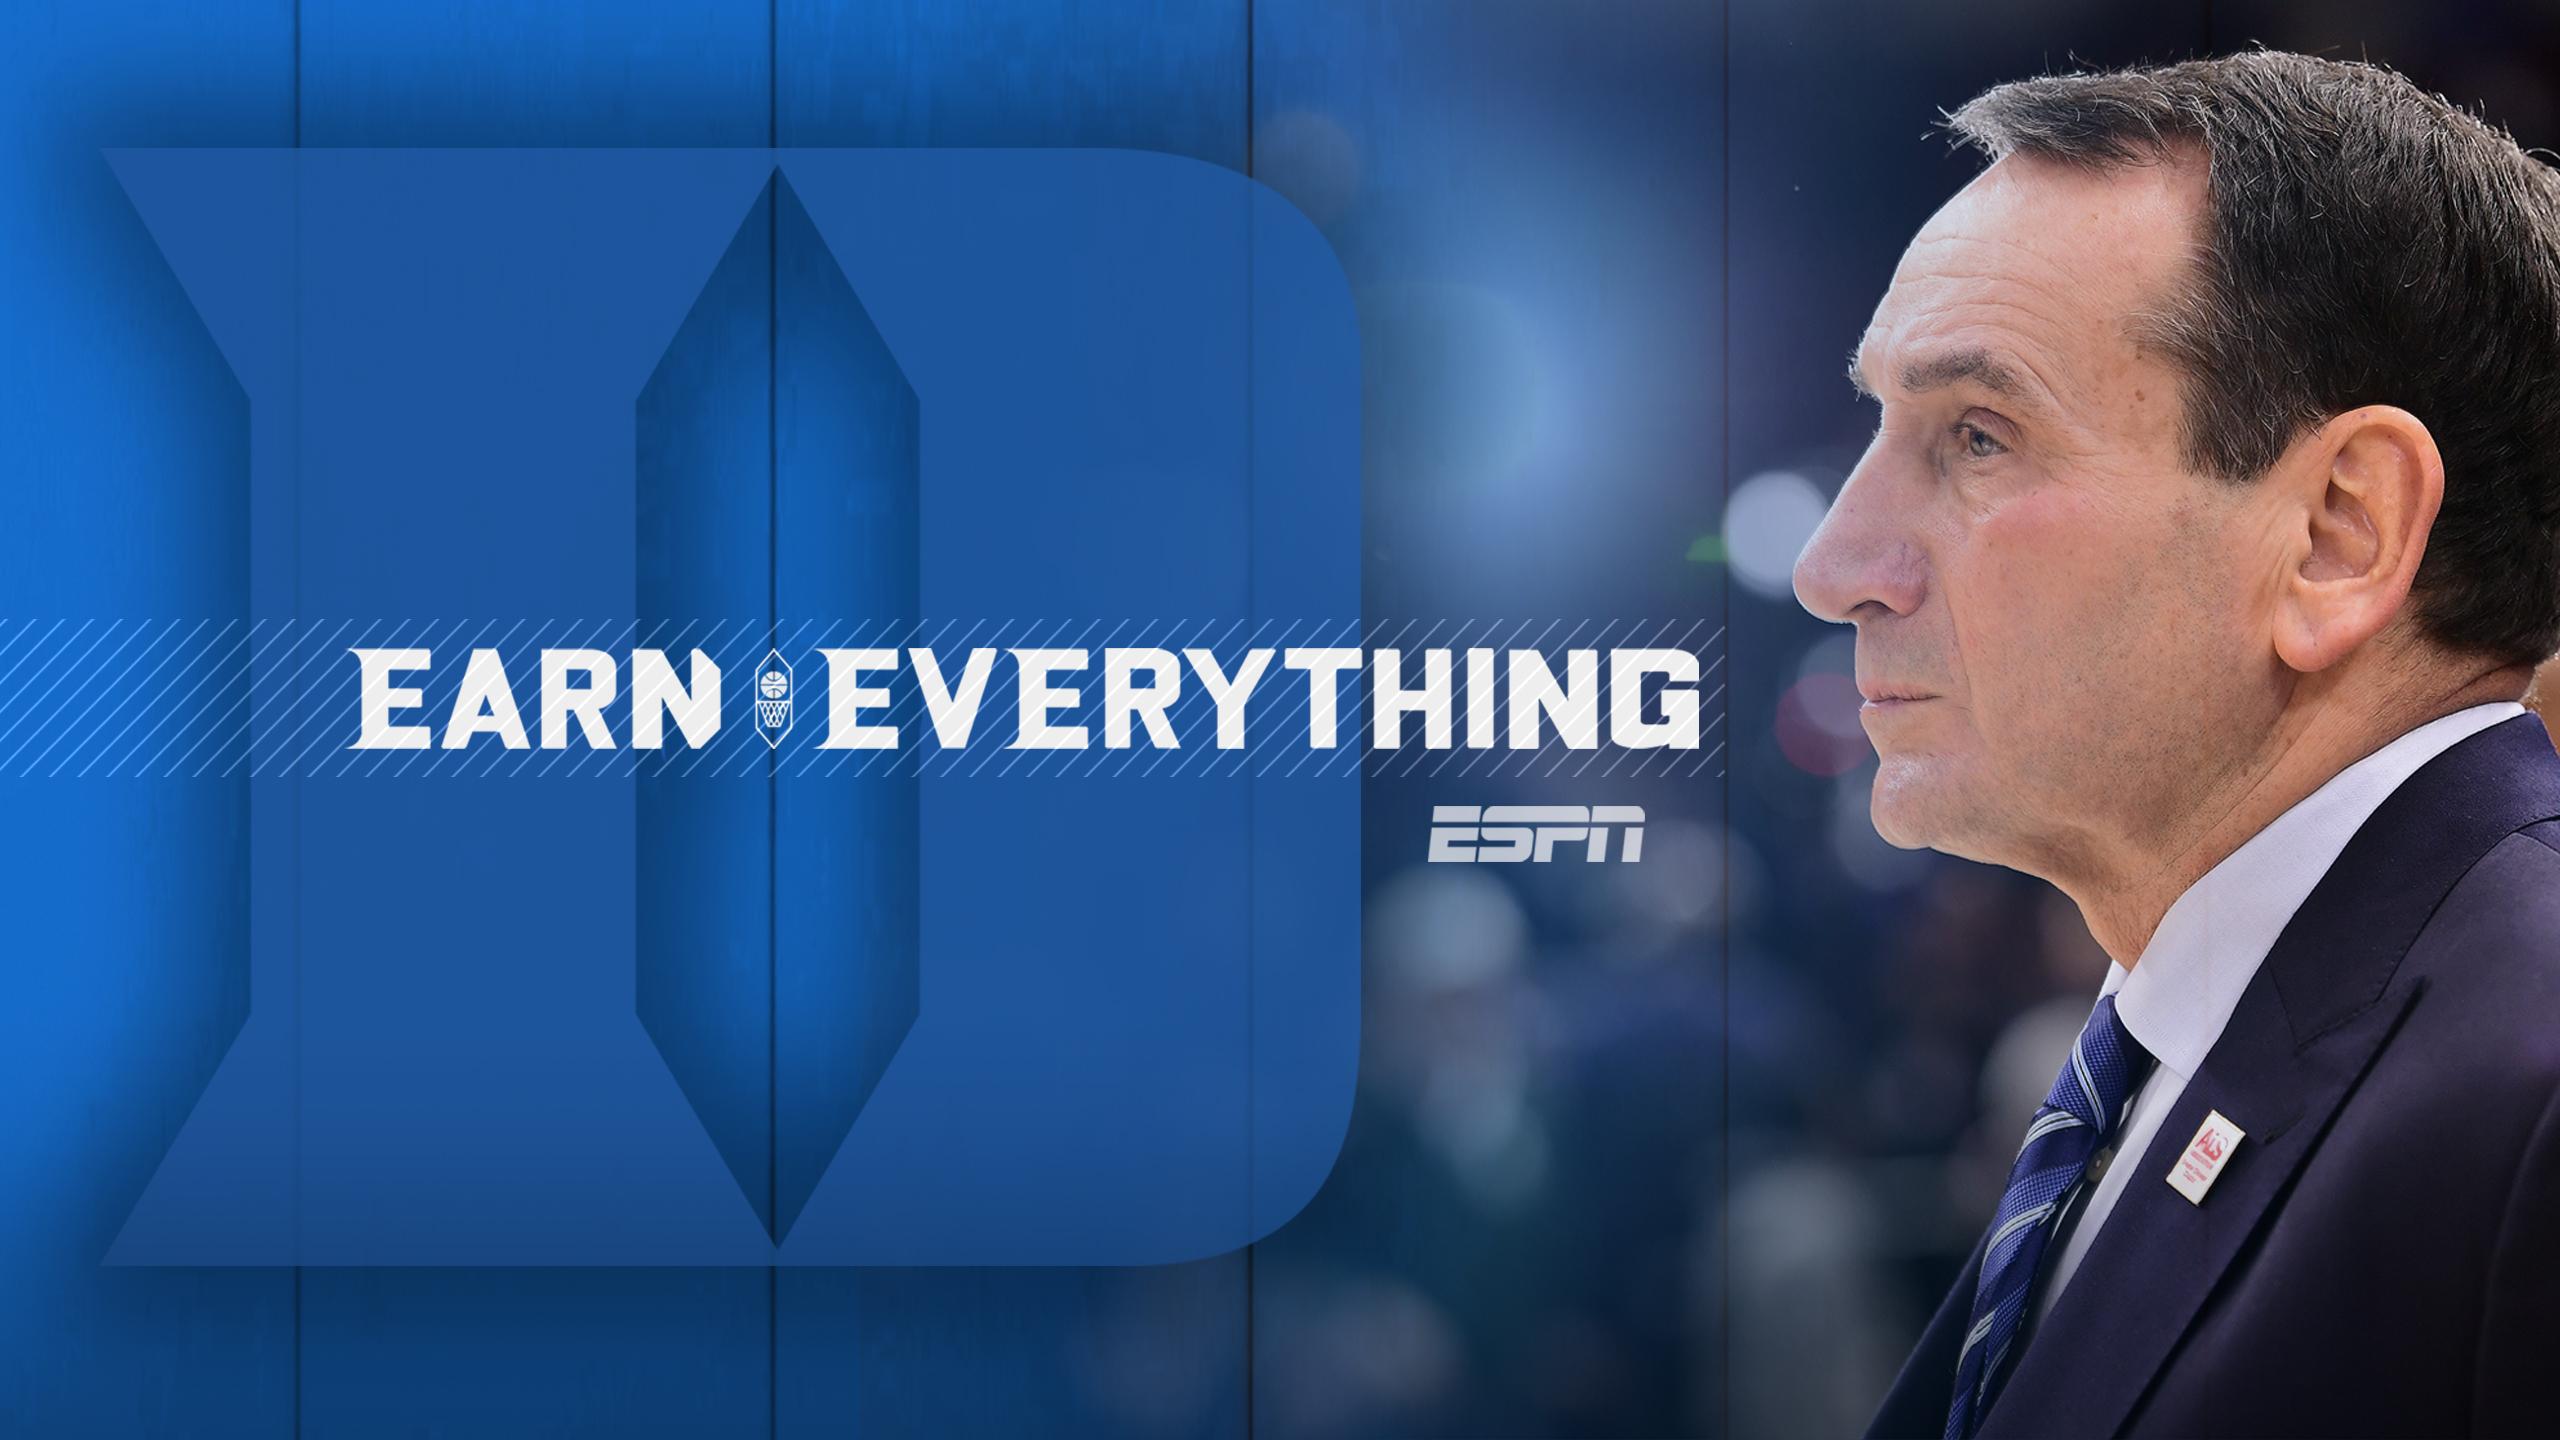 Earn Everything